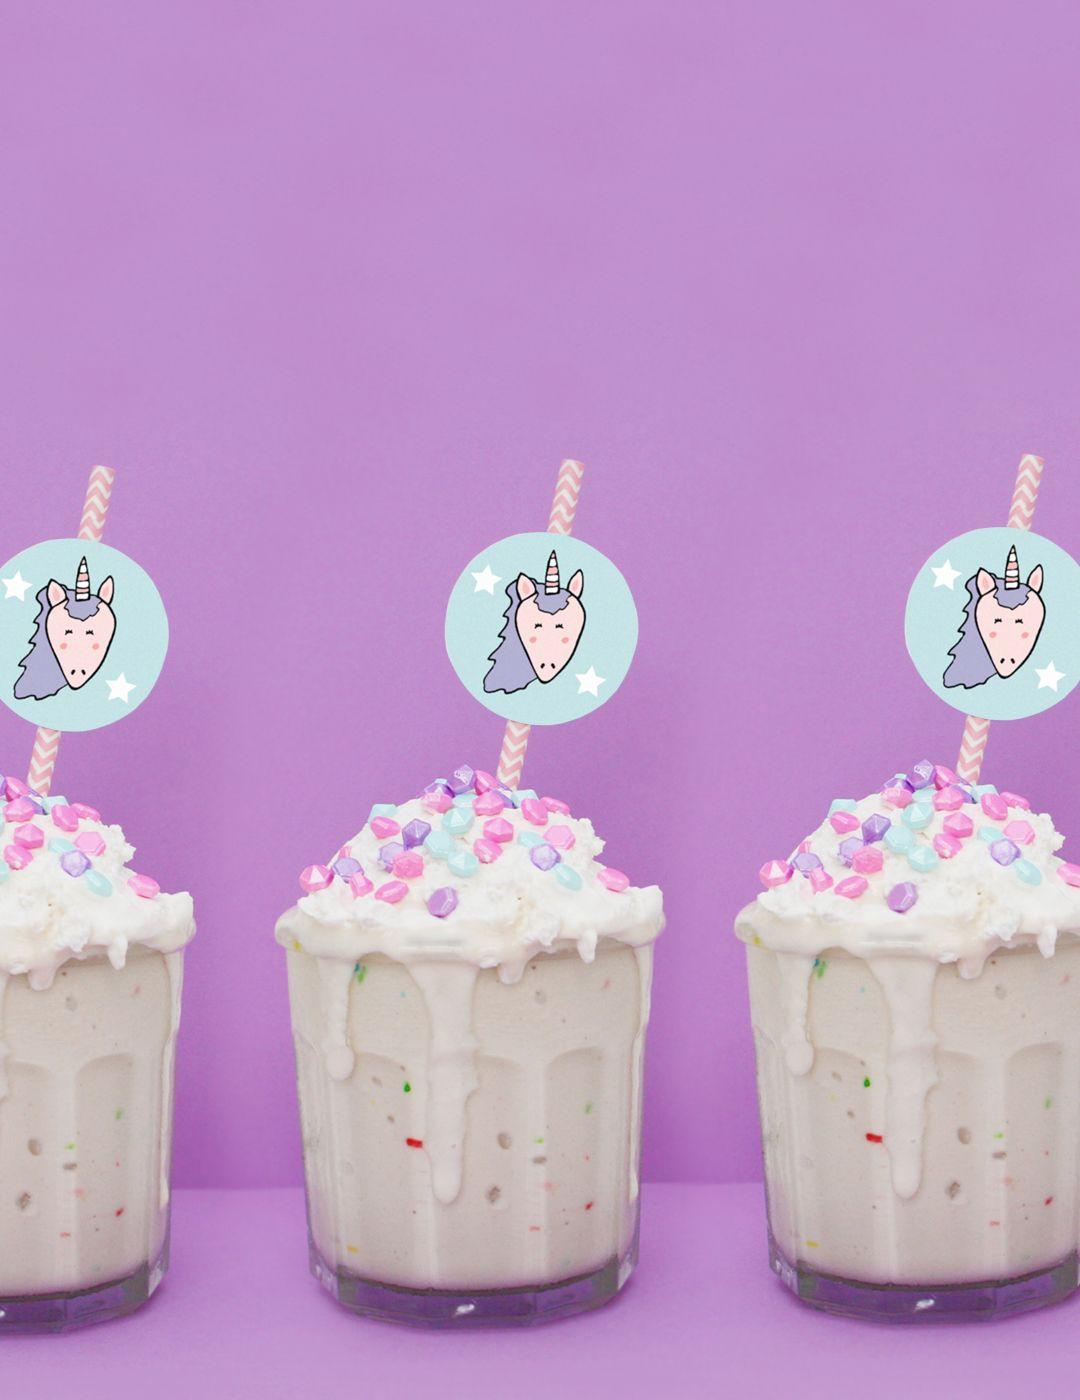 Birthday Cake Milkshake + Unicorn Straw Toppers (Free Printable!)